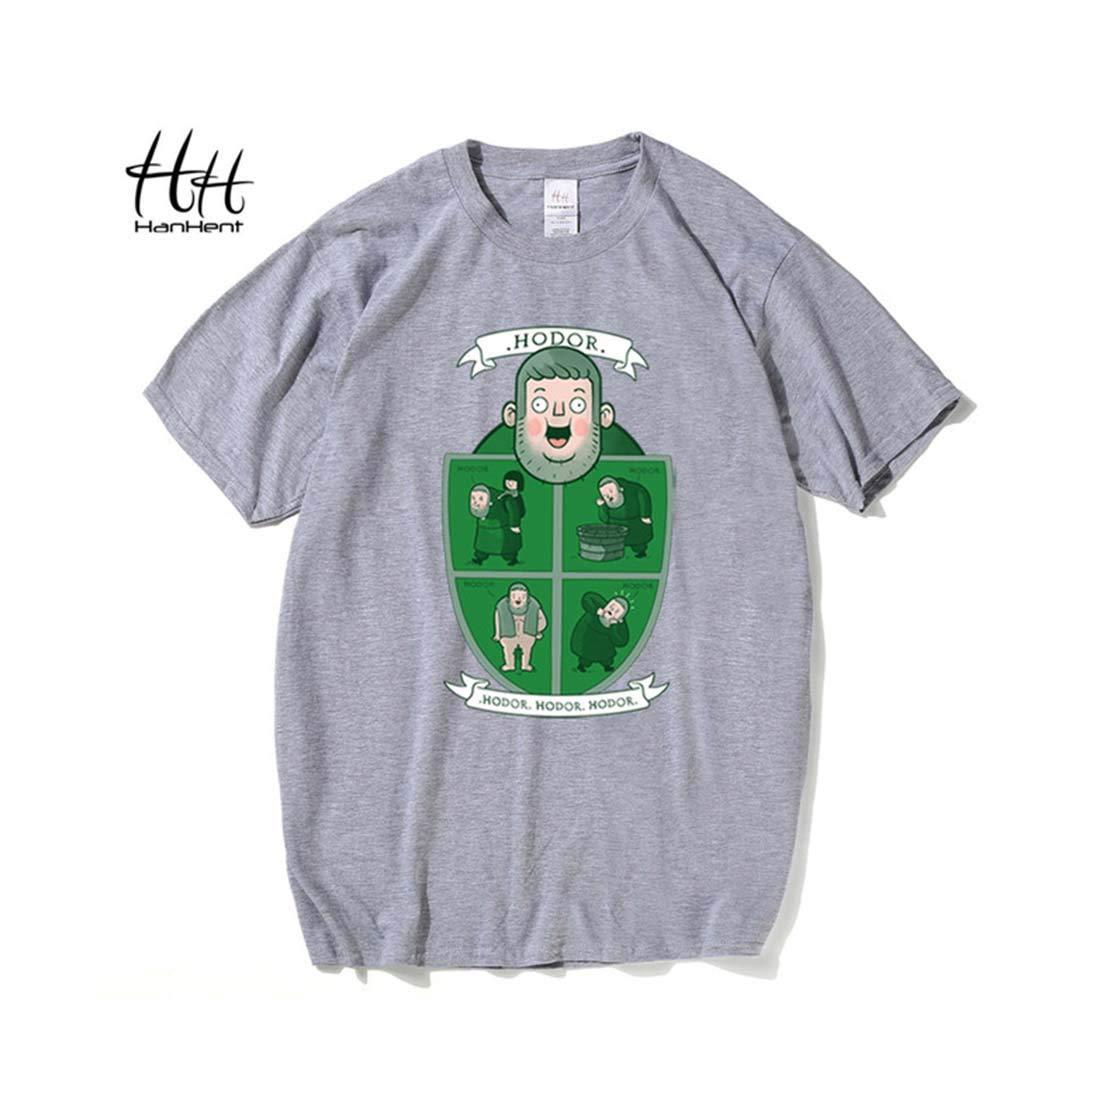 Indikart Export HANHENT HH Cotton Round Neck Grey Men T Shirt